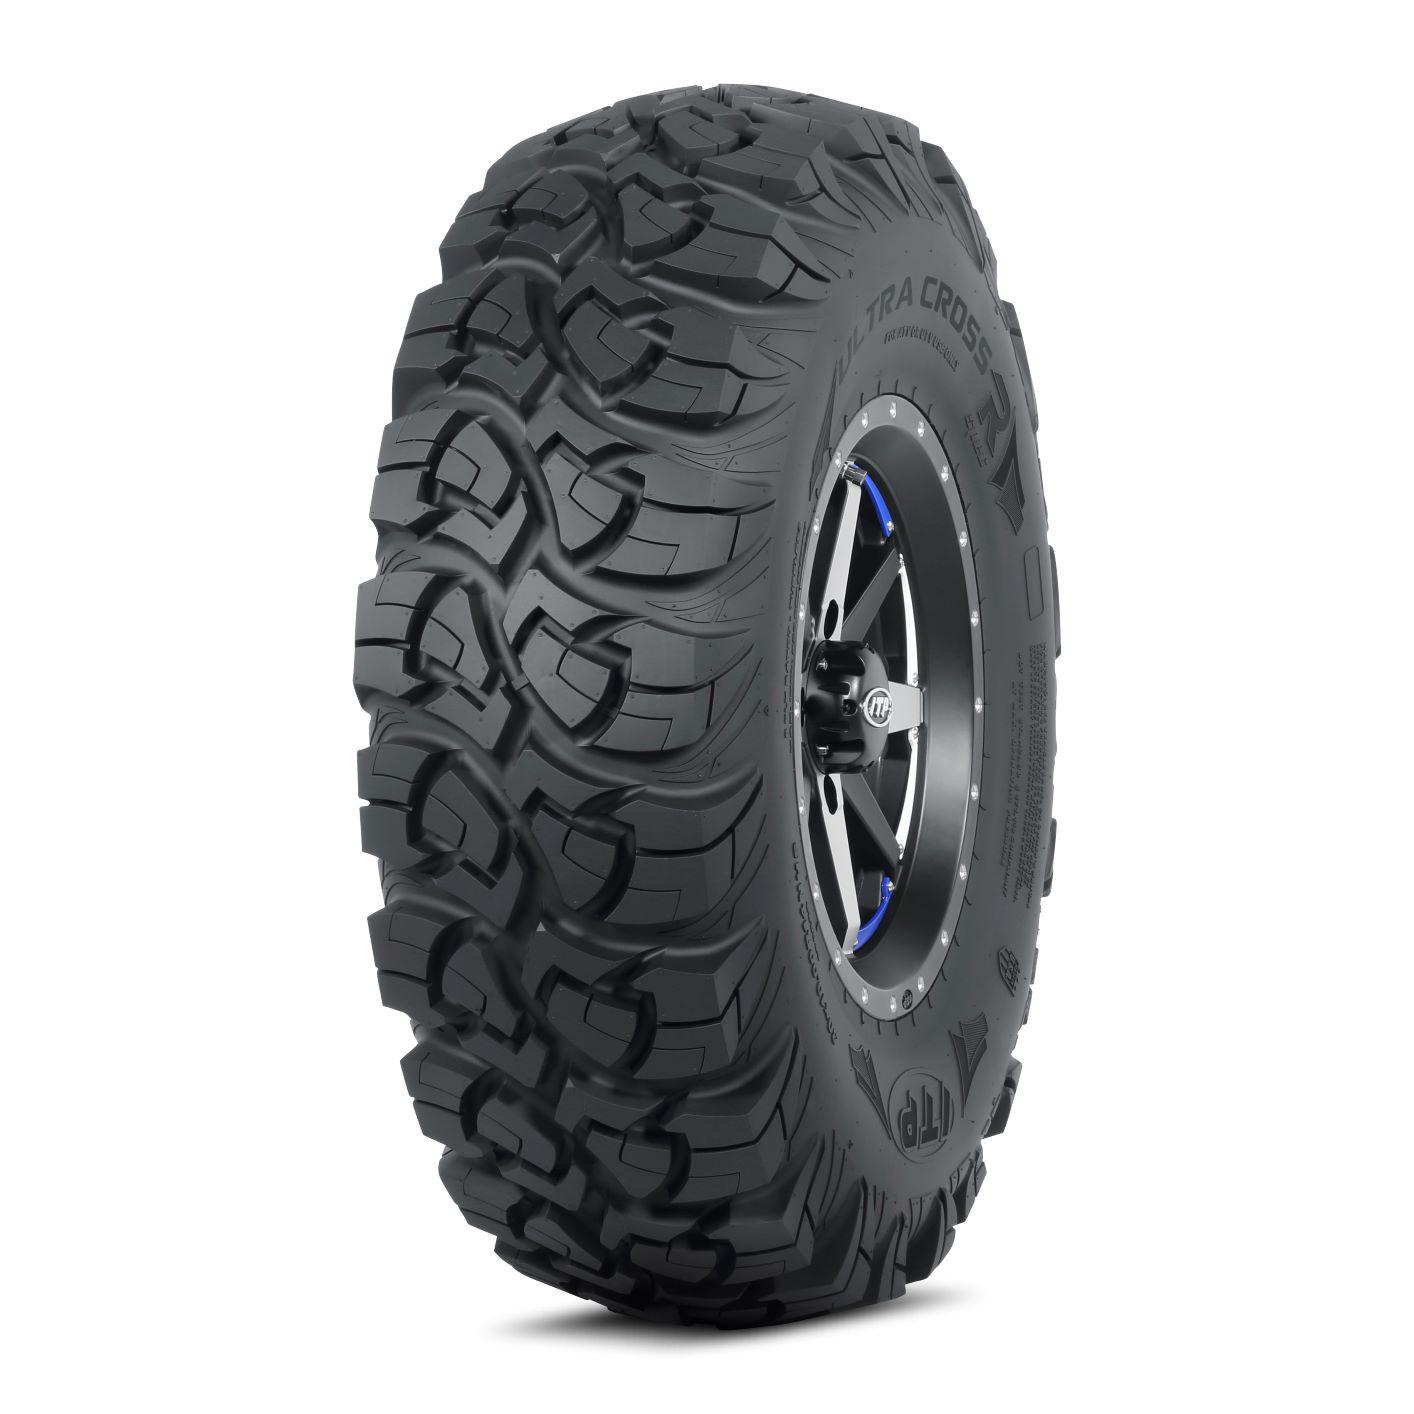 Carlstar's ITP Ultra Cross R Spec Tire Has a New Design